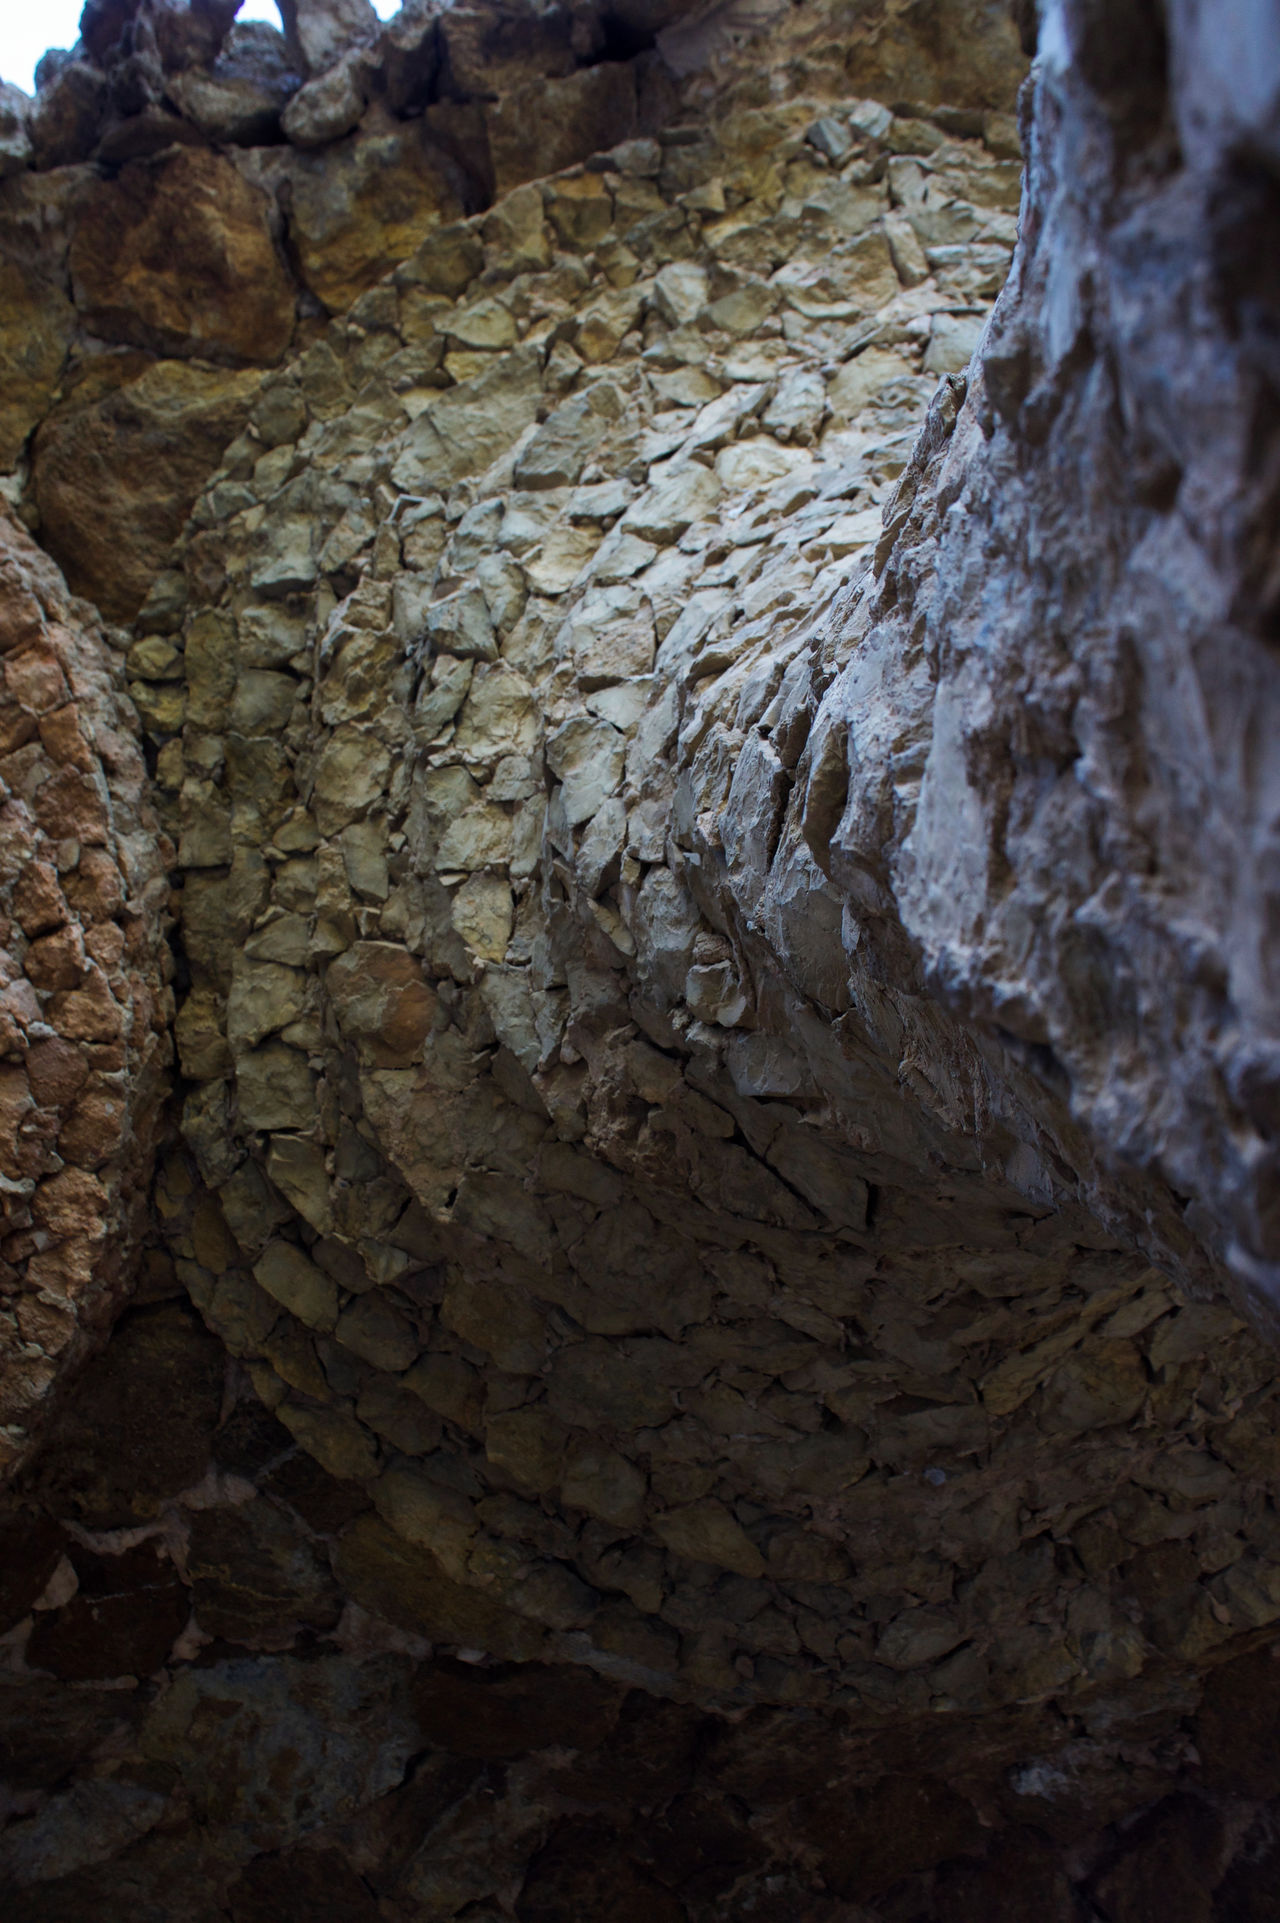 Architecture Art Barcelona Beautiful City Close-up Column Day Enjoying Life Gaudi Modern Nature No People Outdoors Pattern Rock - Object Rough SPAIN Spring Taking Photos The Architect - 2016 EyeEm Awards Travel